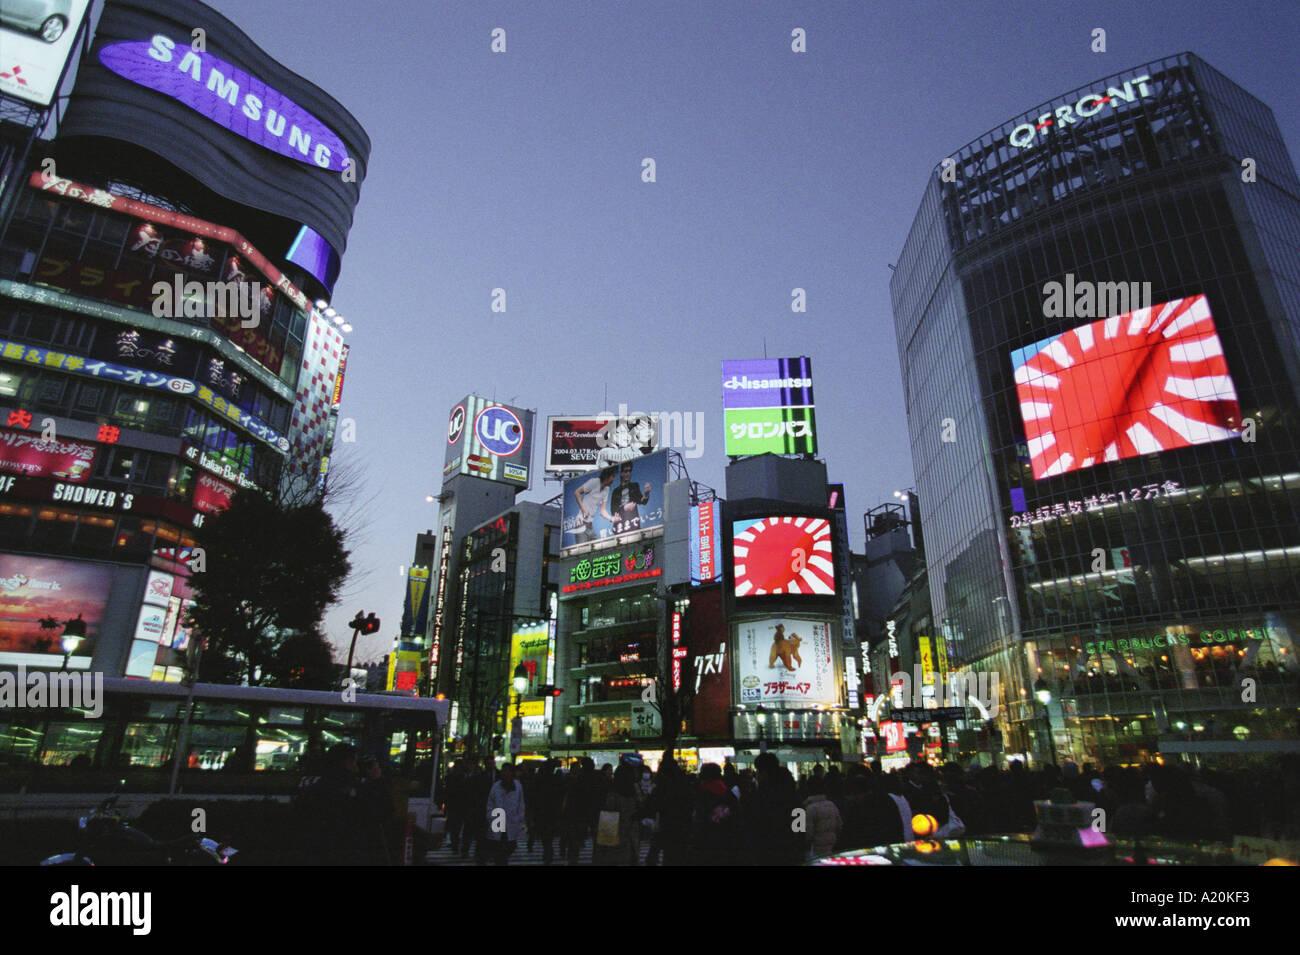 Promo video for Japan Marine Self Defense Force, Shibuya, Tokyo, Japan - Stock Image